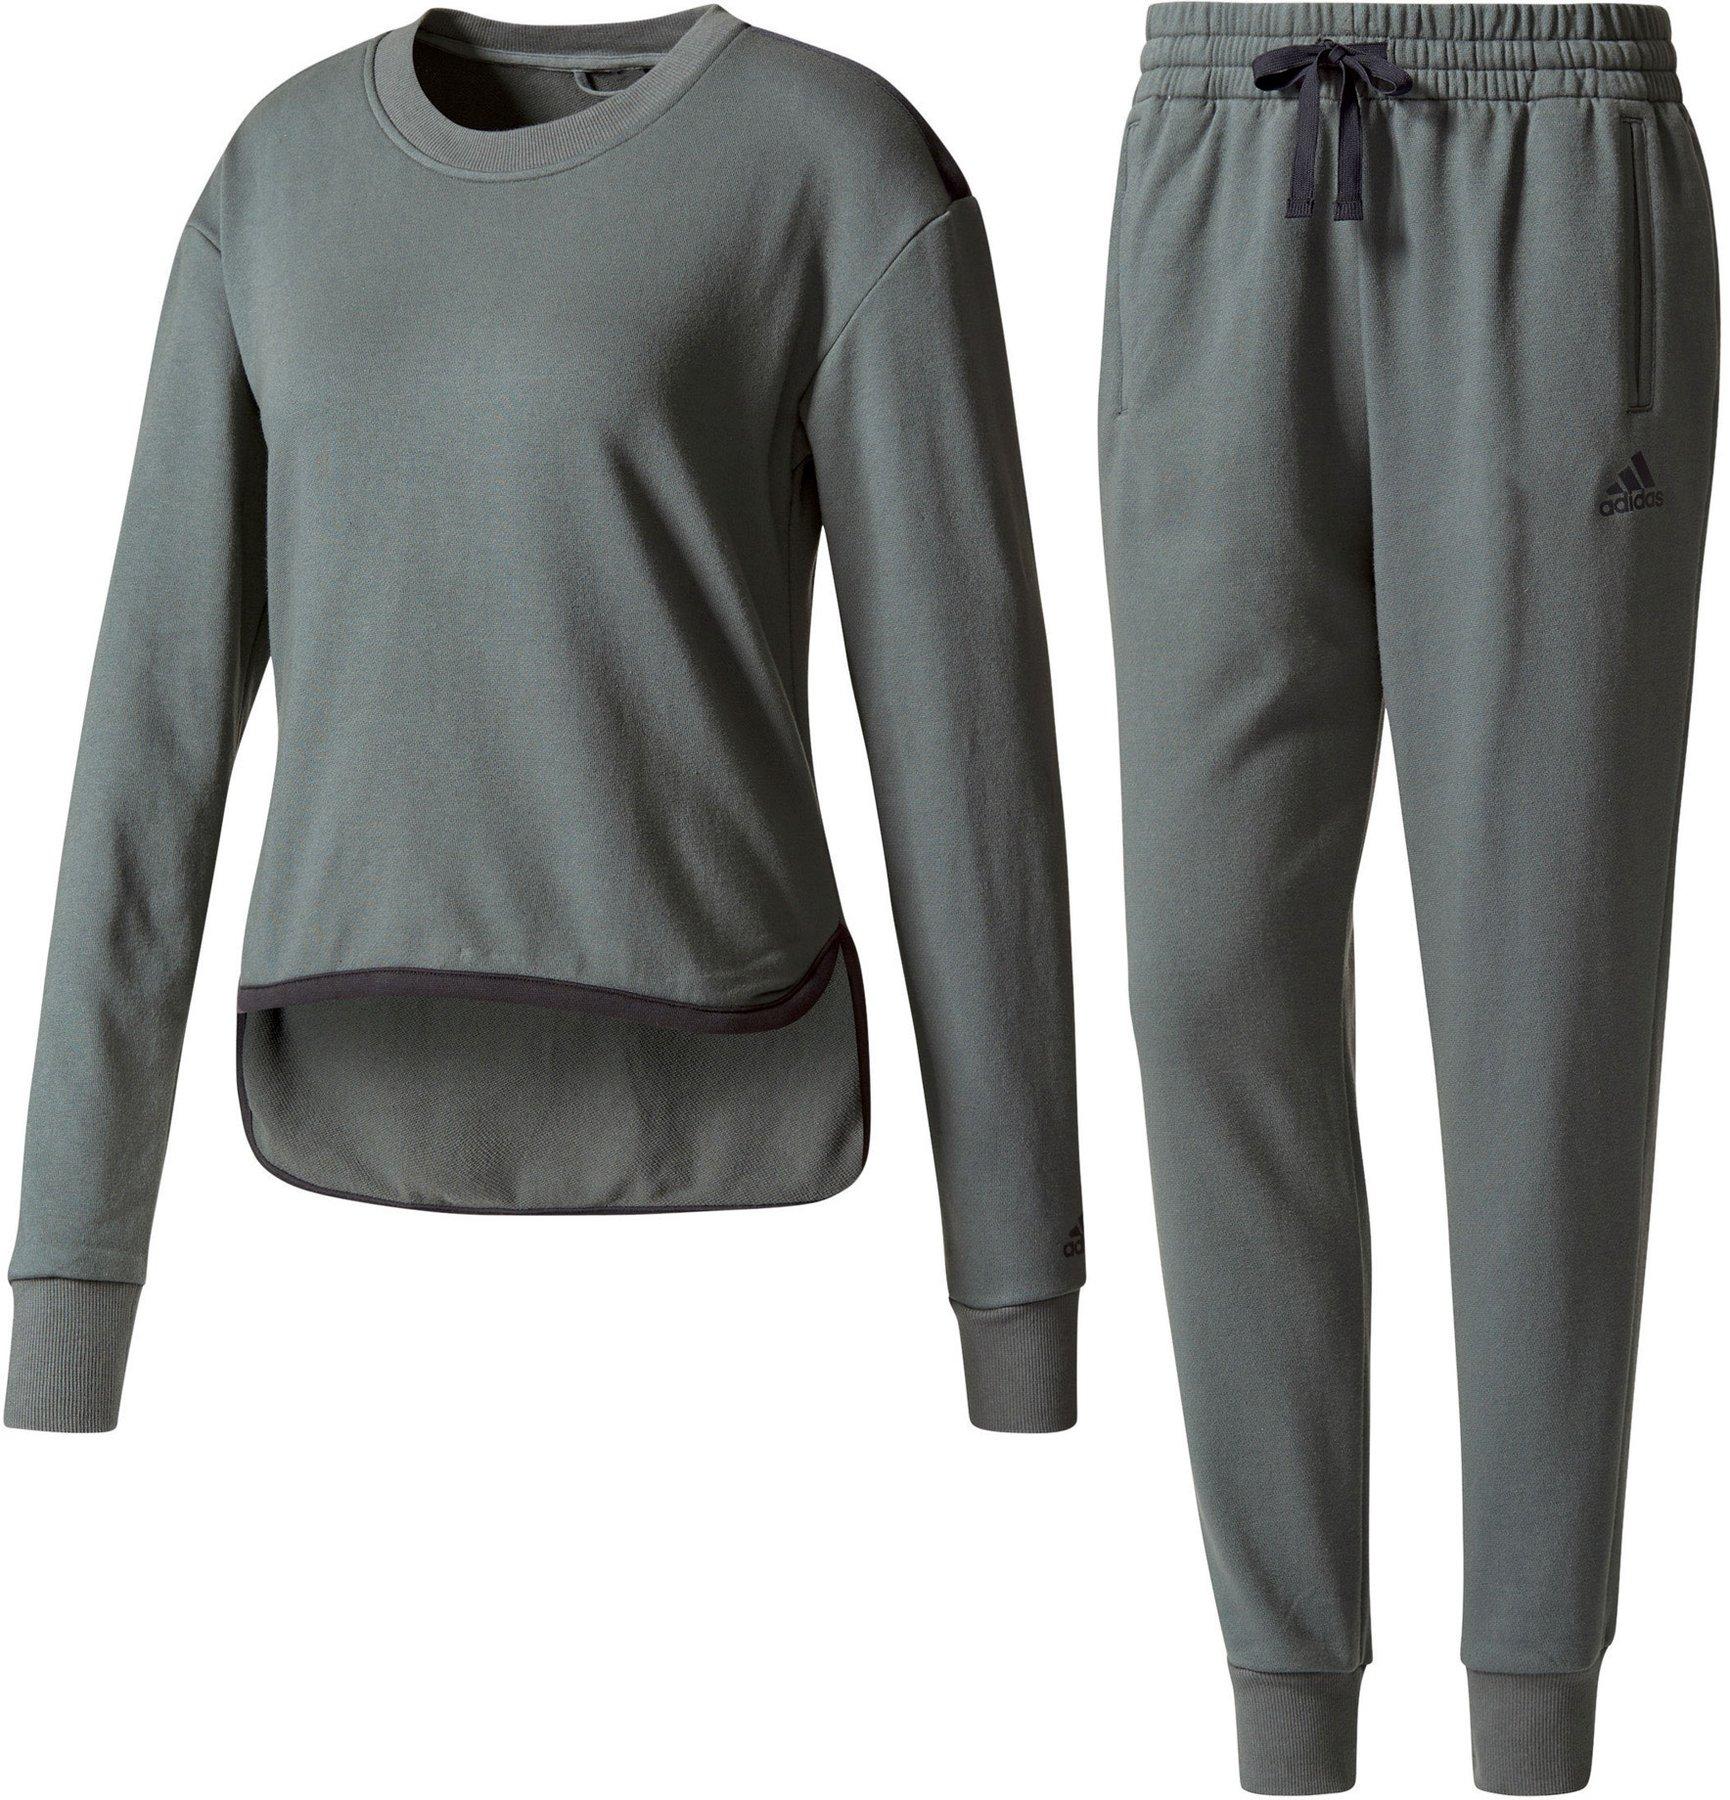 Räumungspreis genießen Modestil von 2019 Neuankömmling Adidas Chill Out Trainingsanzug Damen utility ivy/black